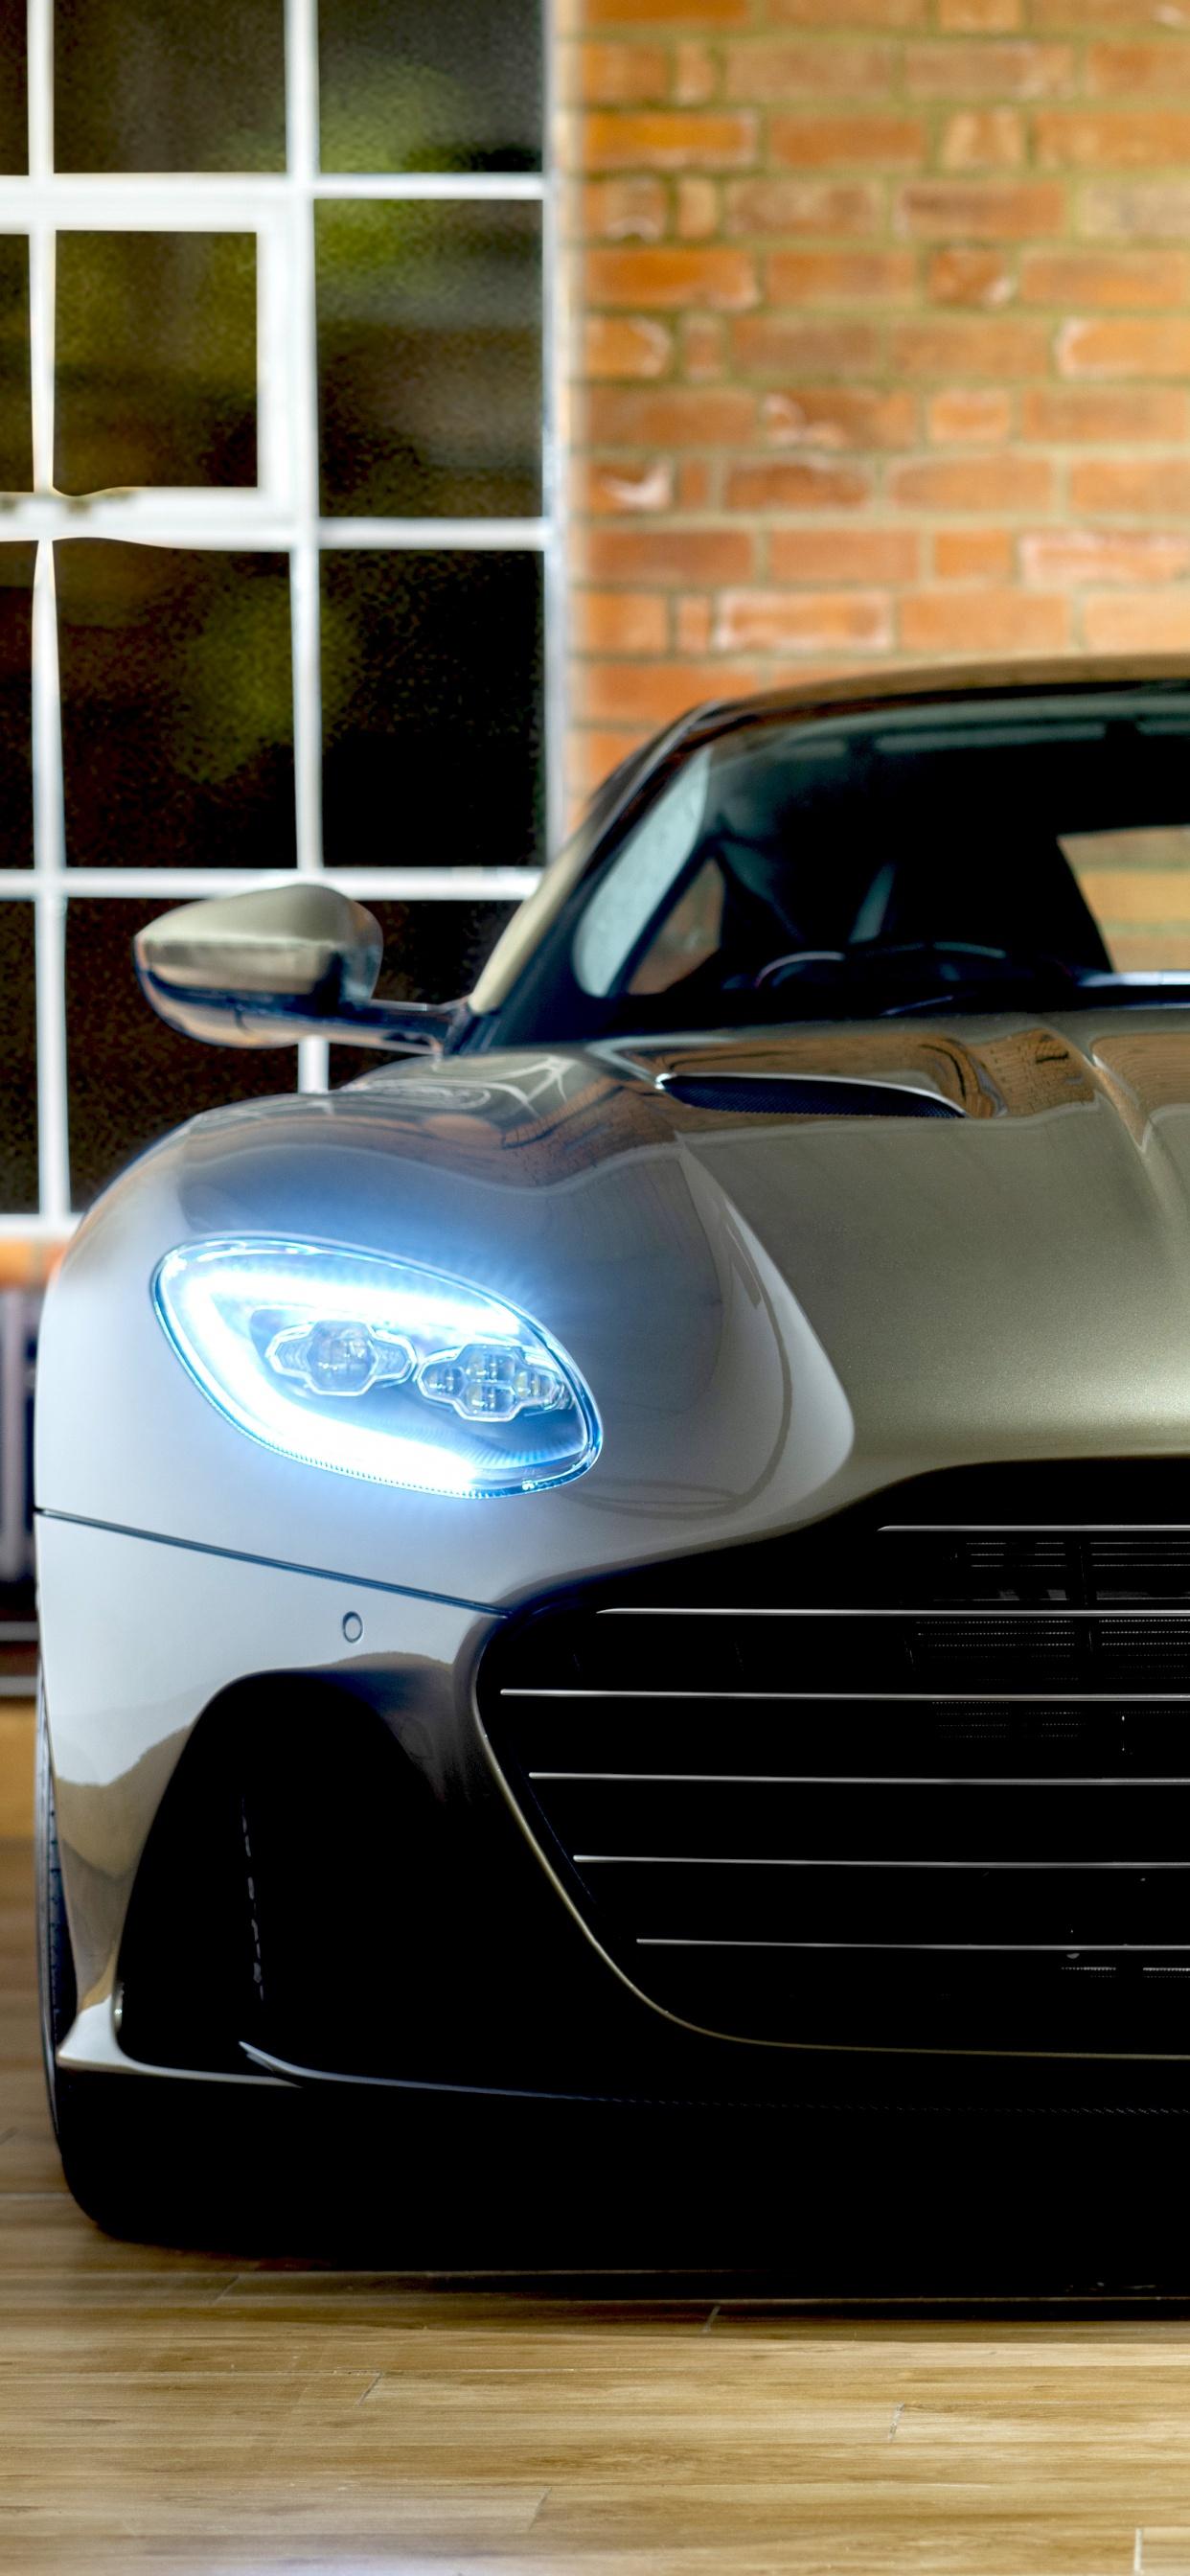 Aston Martin Dbs Superleggera 4k Wallpaper 5k 8k Cars 135